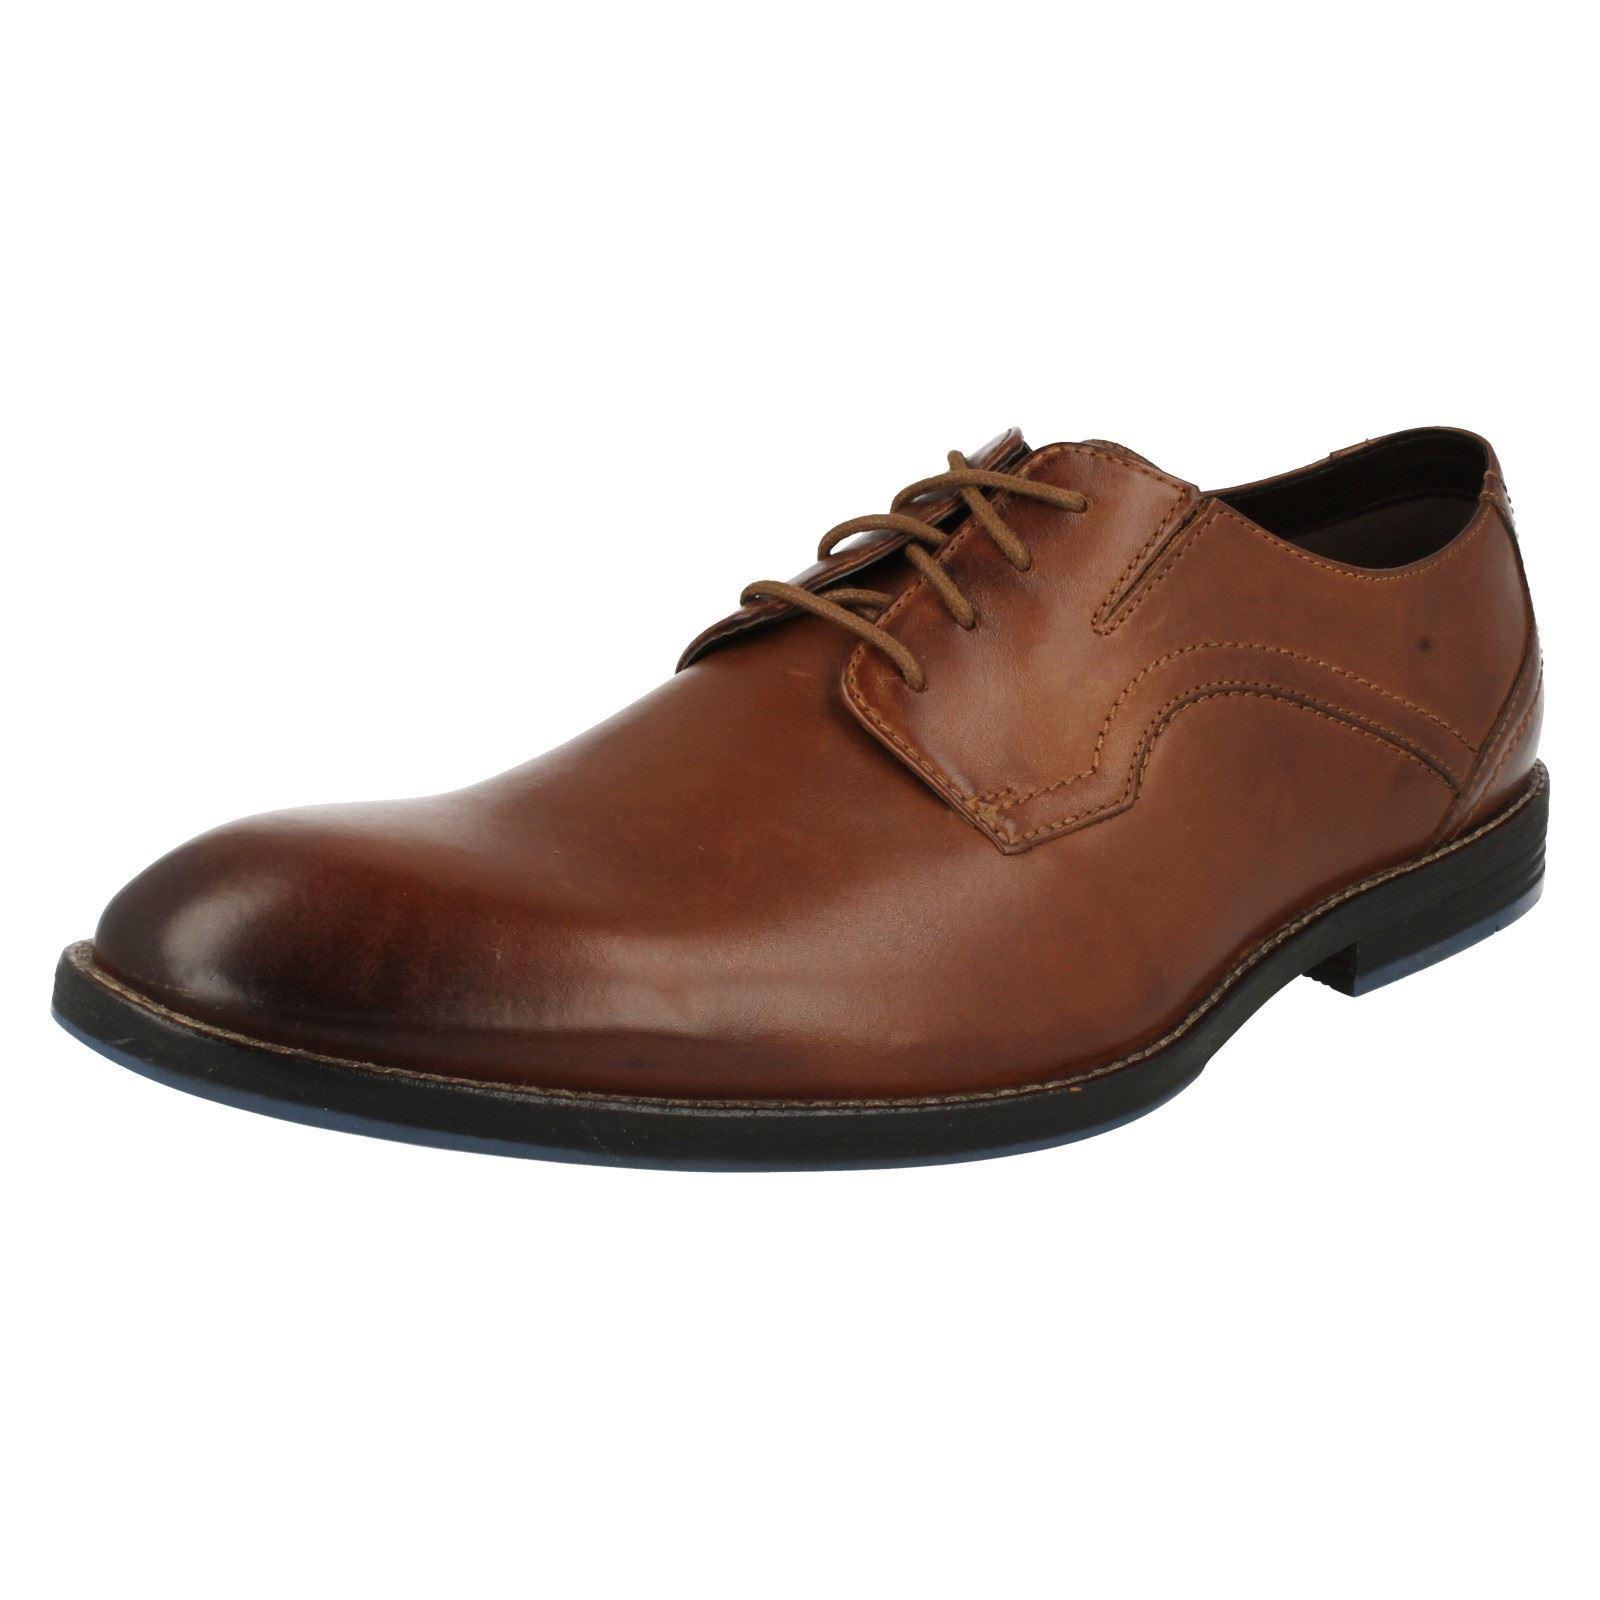 Mens Clarks Formal Formal Formal shoes Prangley Walk 4ae4a2